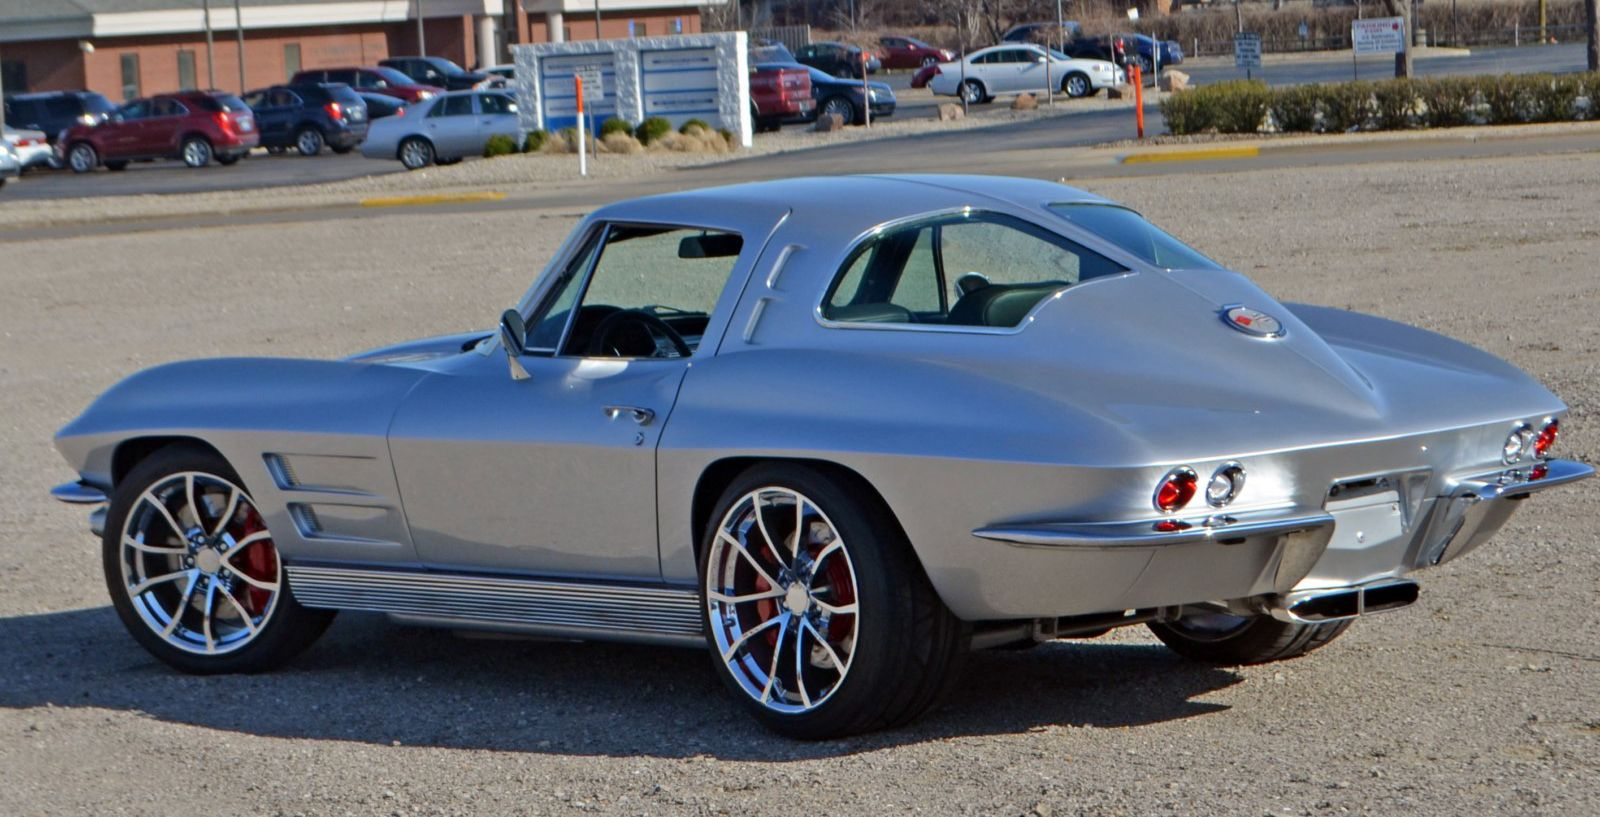 Silver Clean CorVette | Chevrolet corvette classic cars